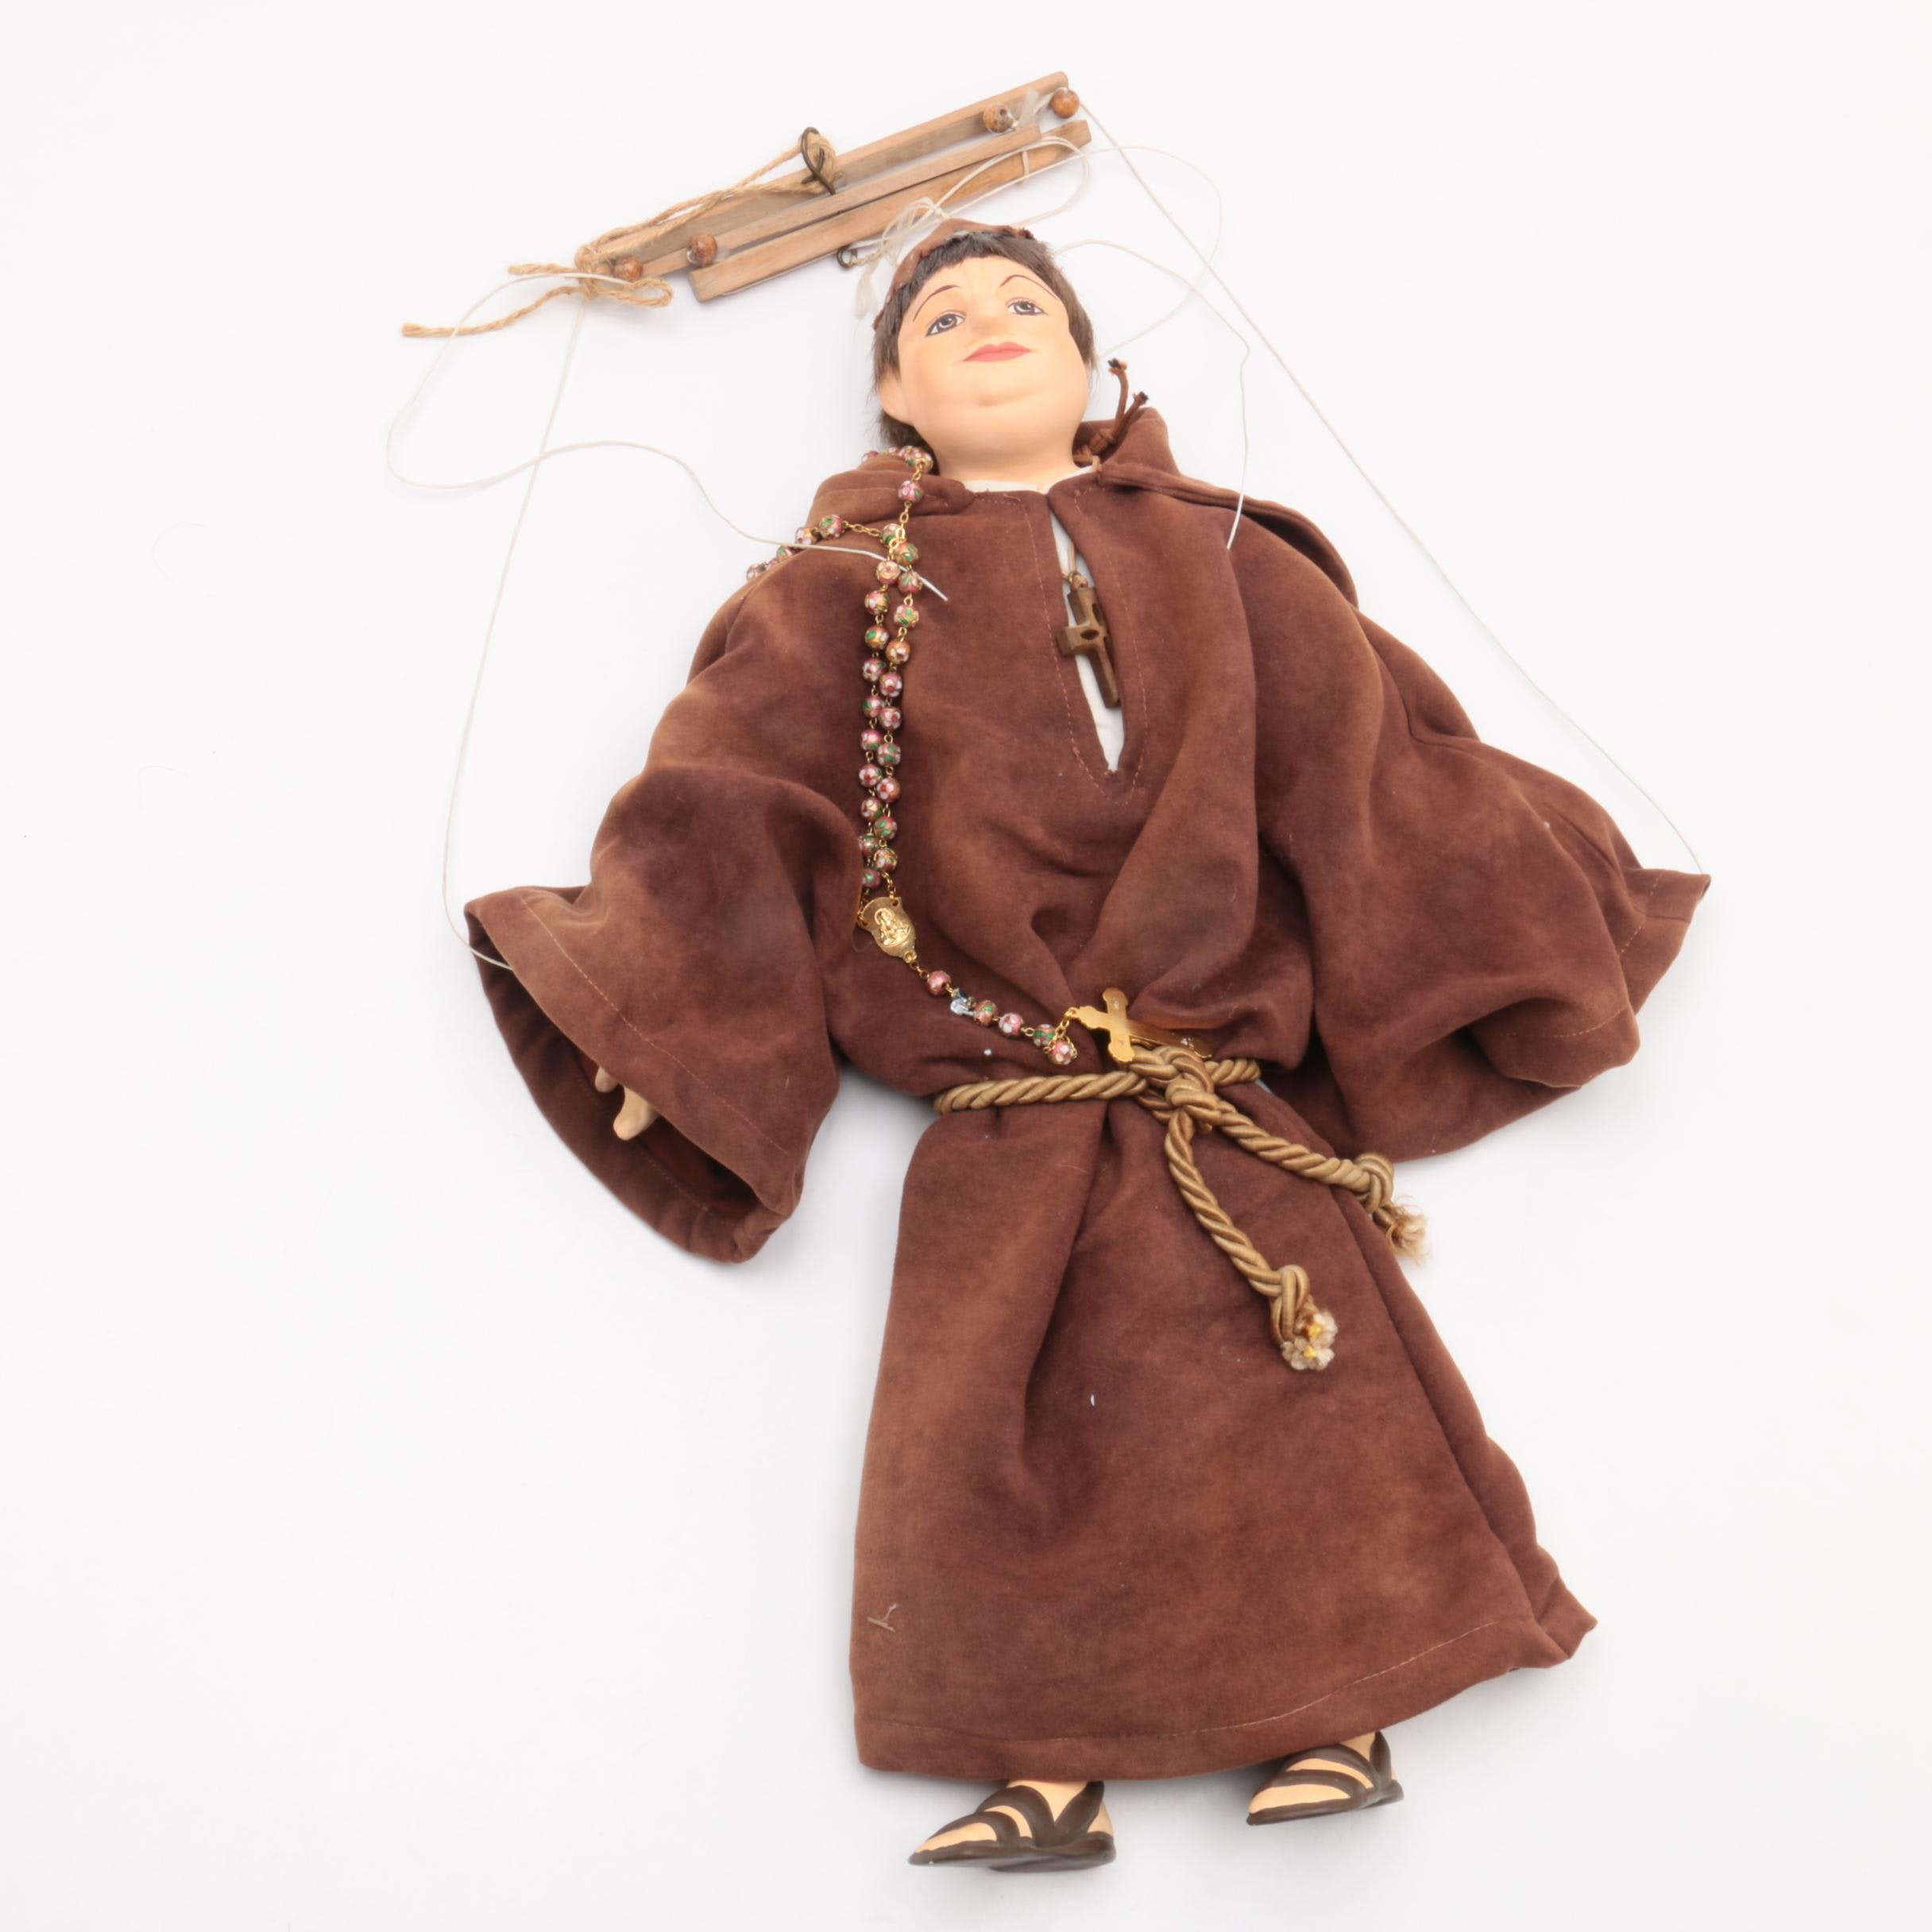 Vintage Hand-Painted Friar Marionette